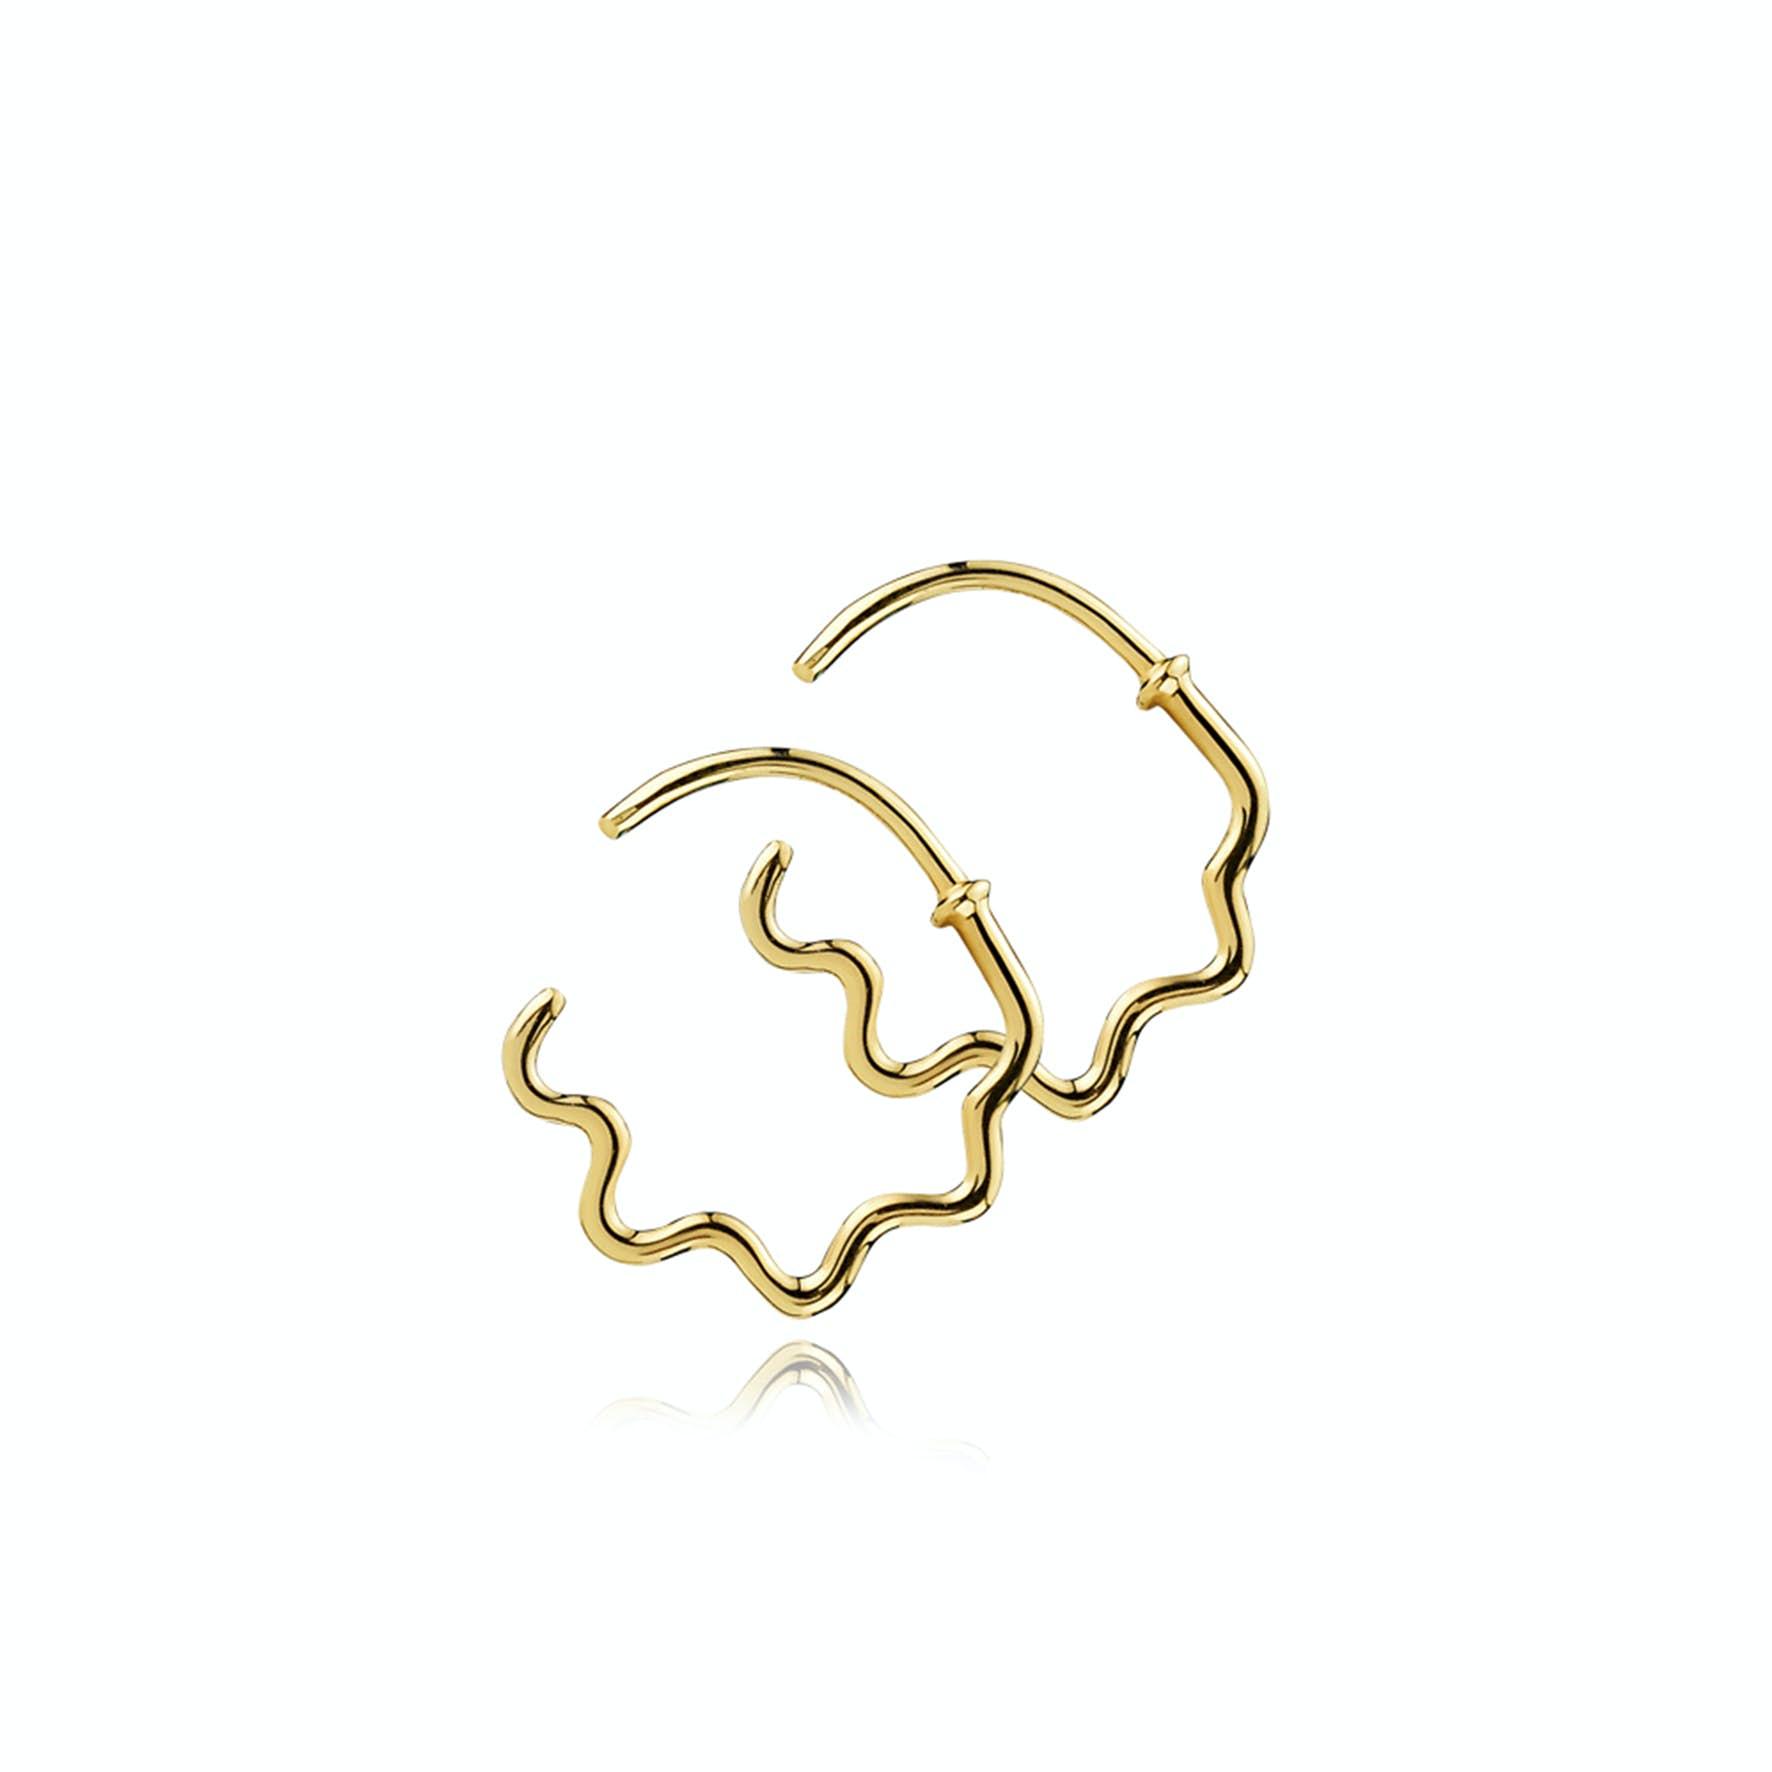 Young One Snake Earrings von Sistie in Vergoldet-Silber Sterling 925